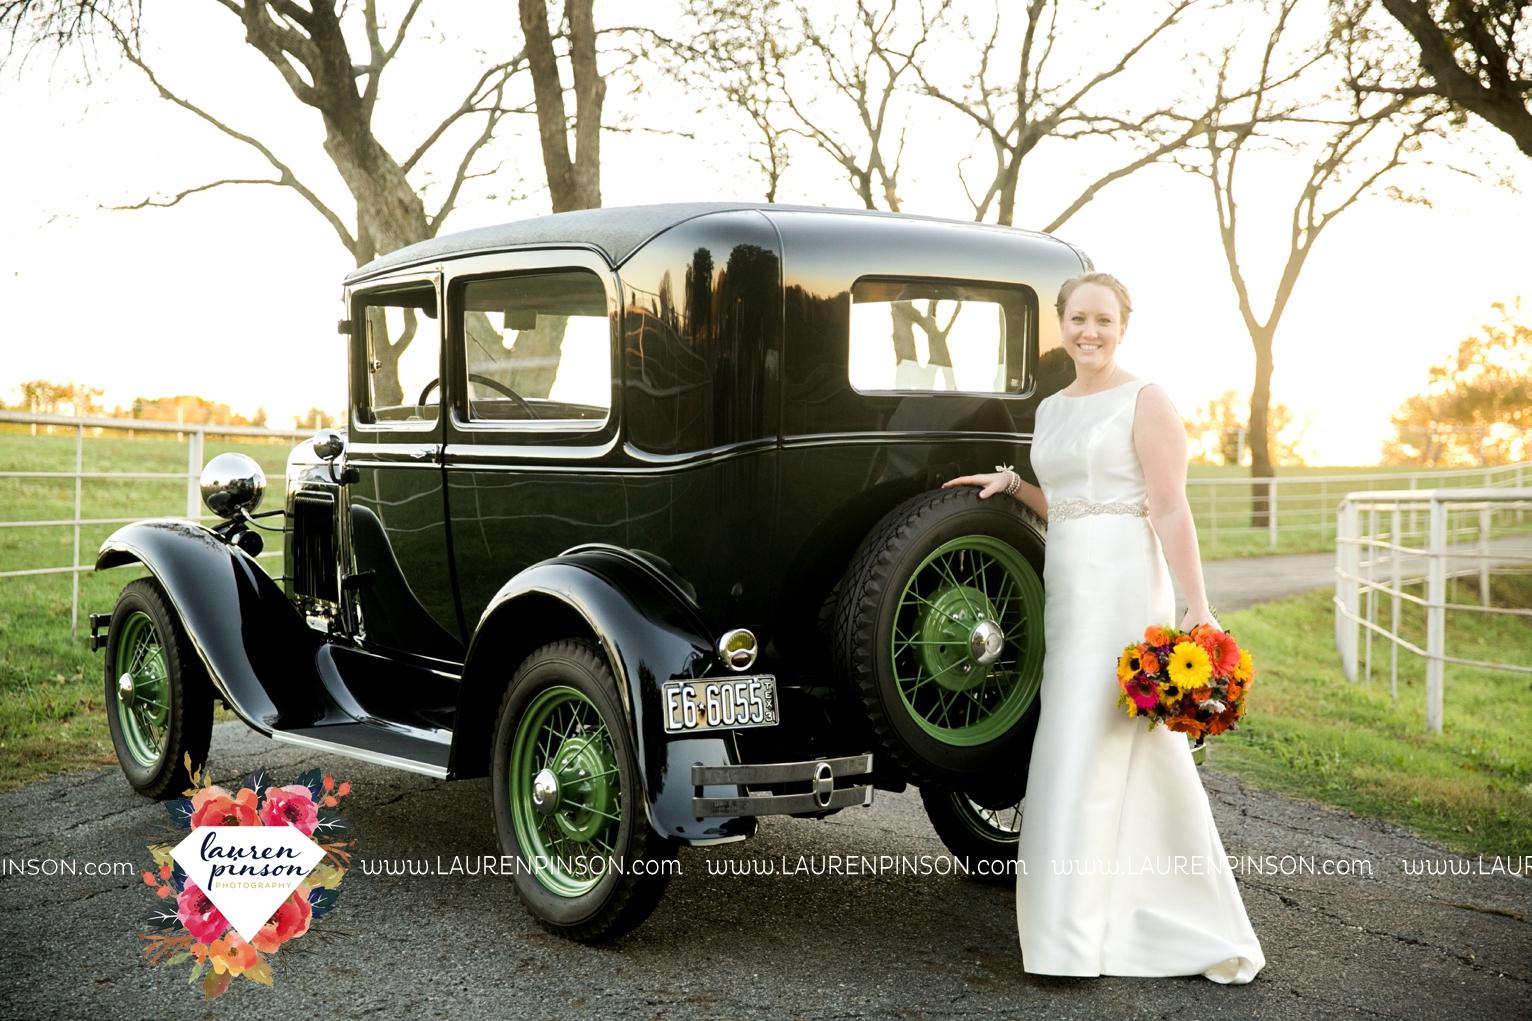 bells-texas-wedding-photography-at-willowood-ranch-chapel-north-texas-wichita-falls-wedding-photographer_1836.jpg